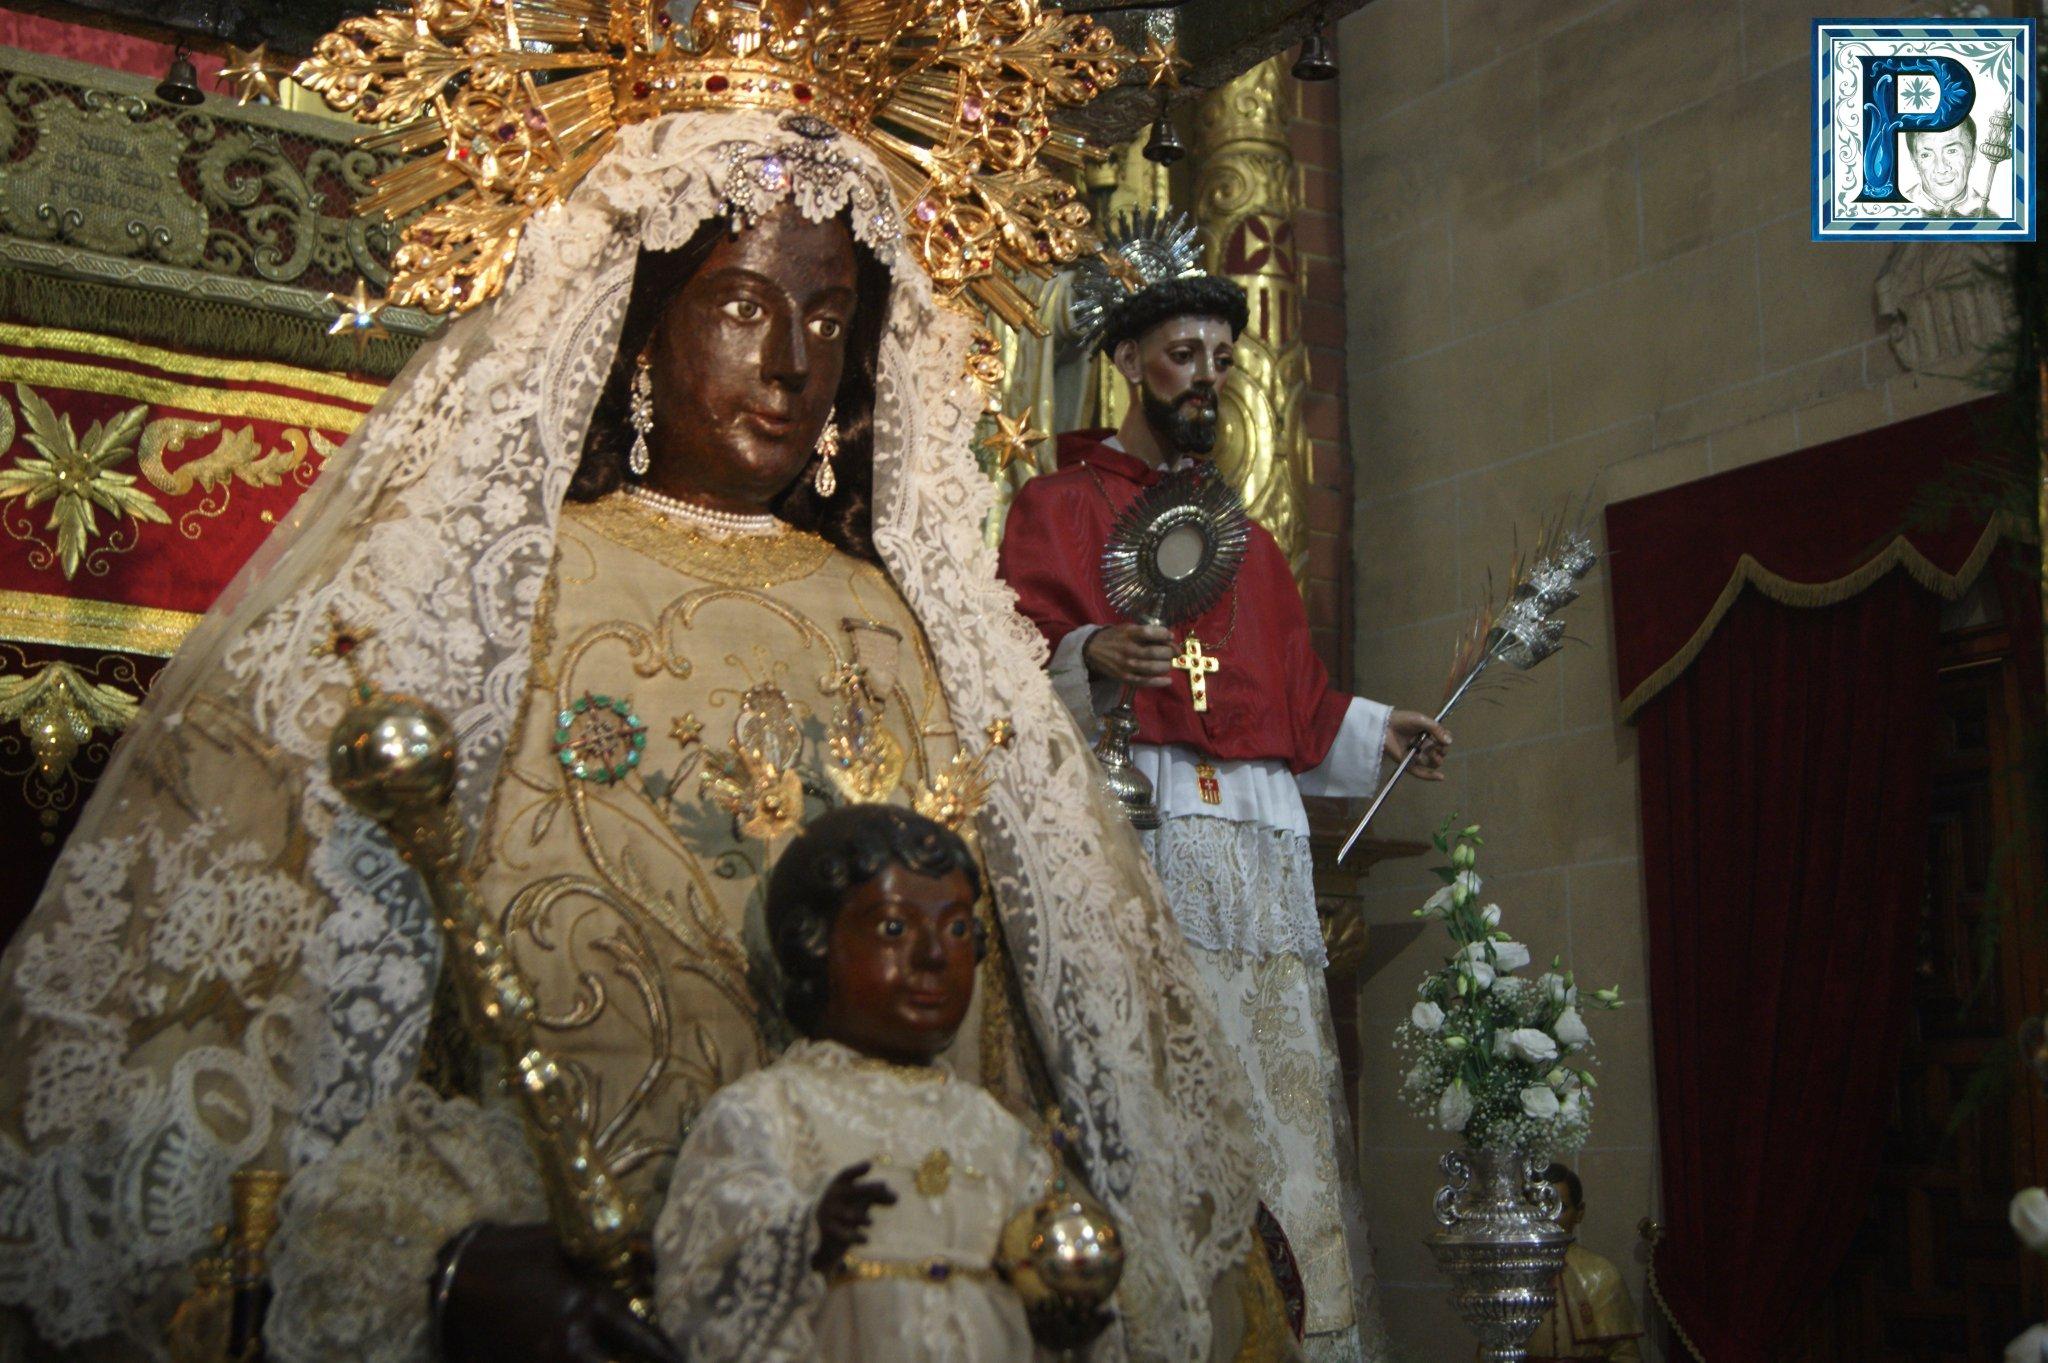 Novena en honor a la Santísima Virgen de la Merced